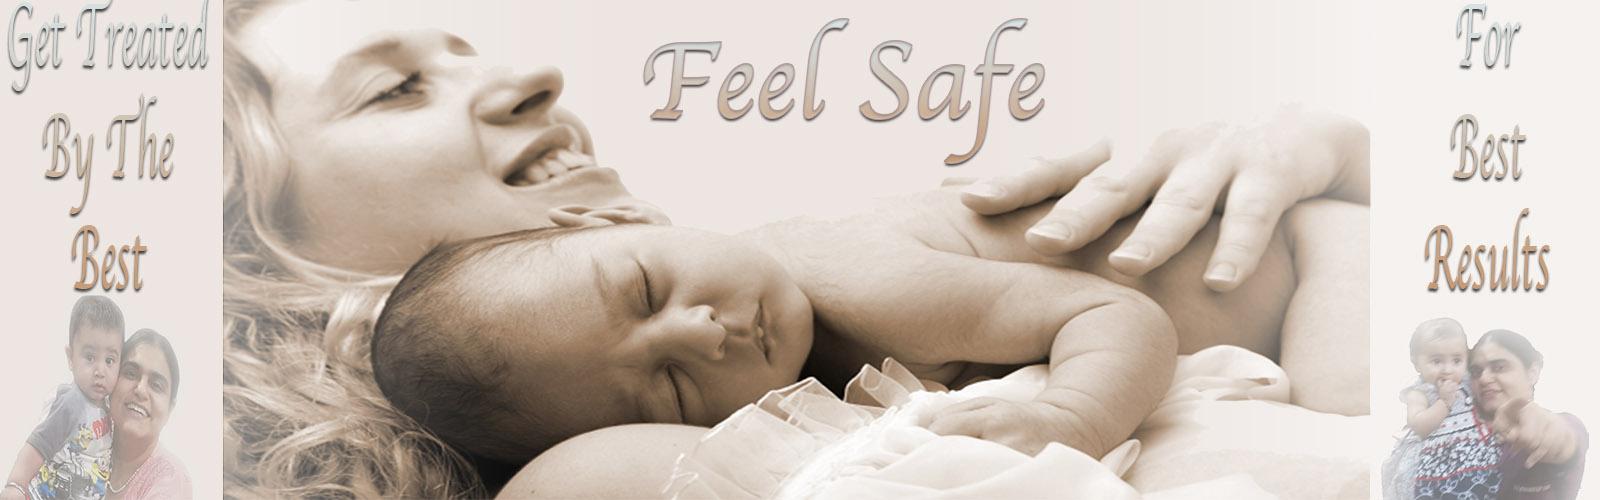 Best IVF Center Punjab